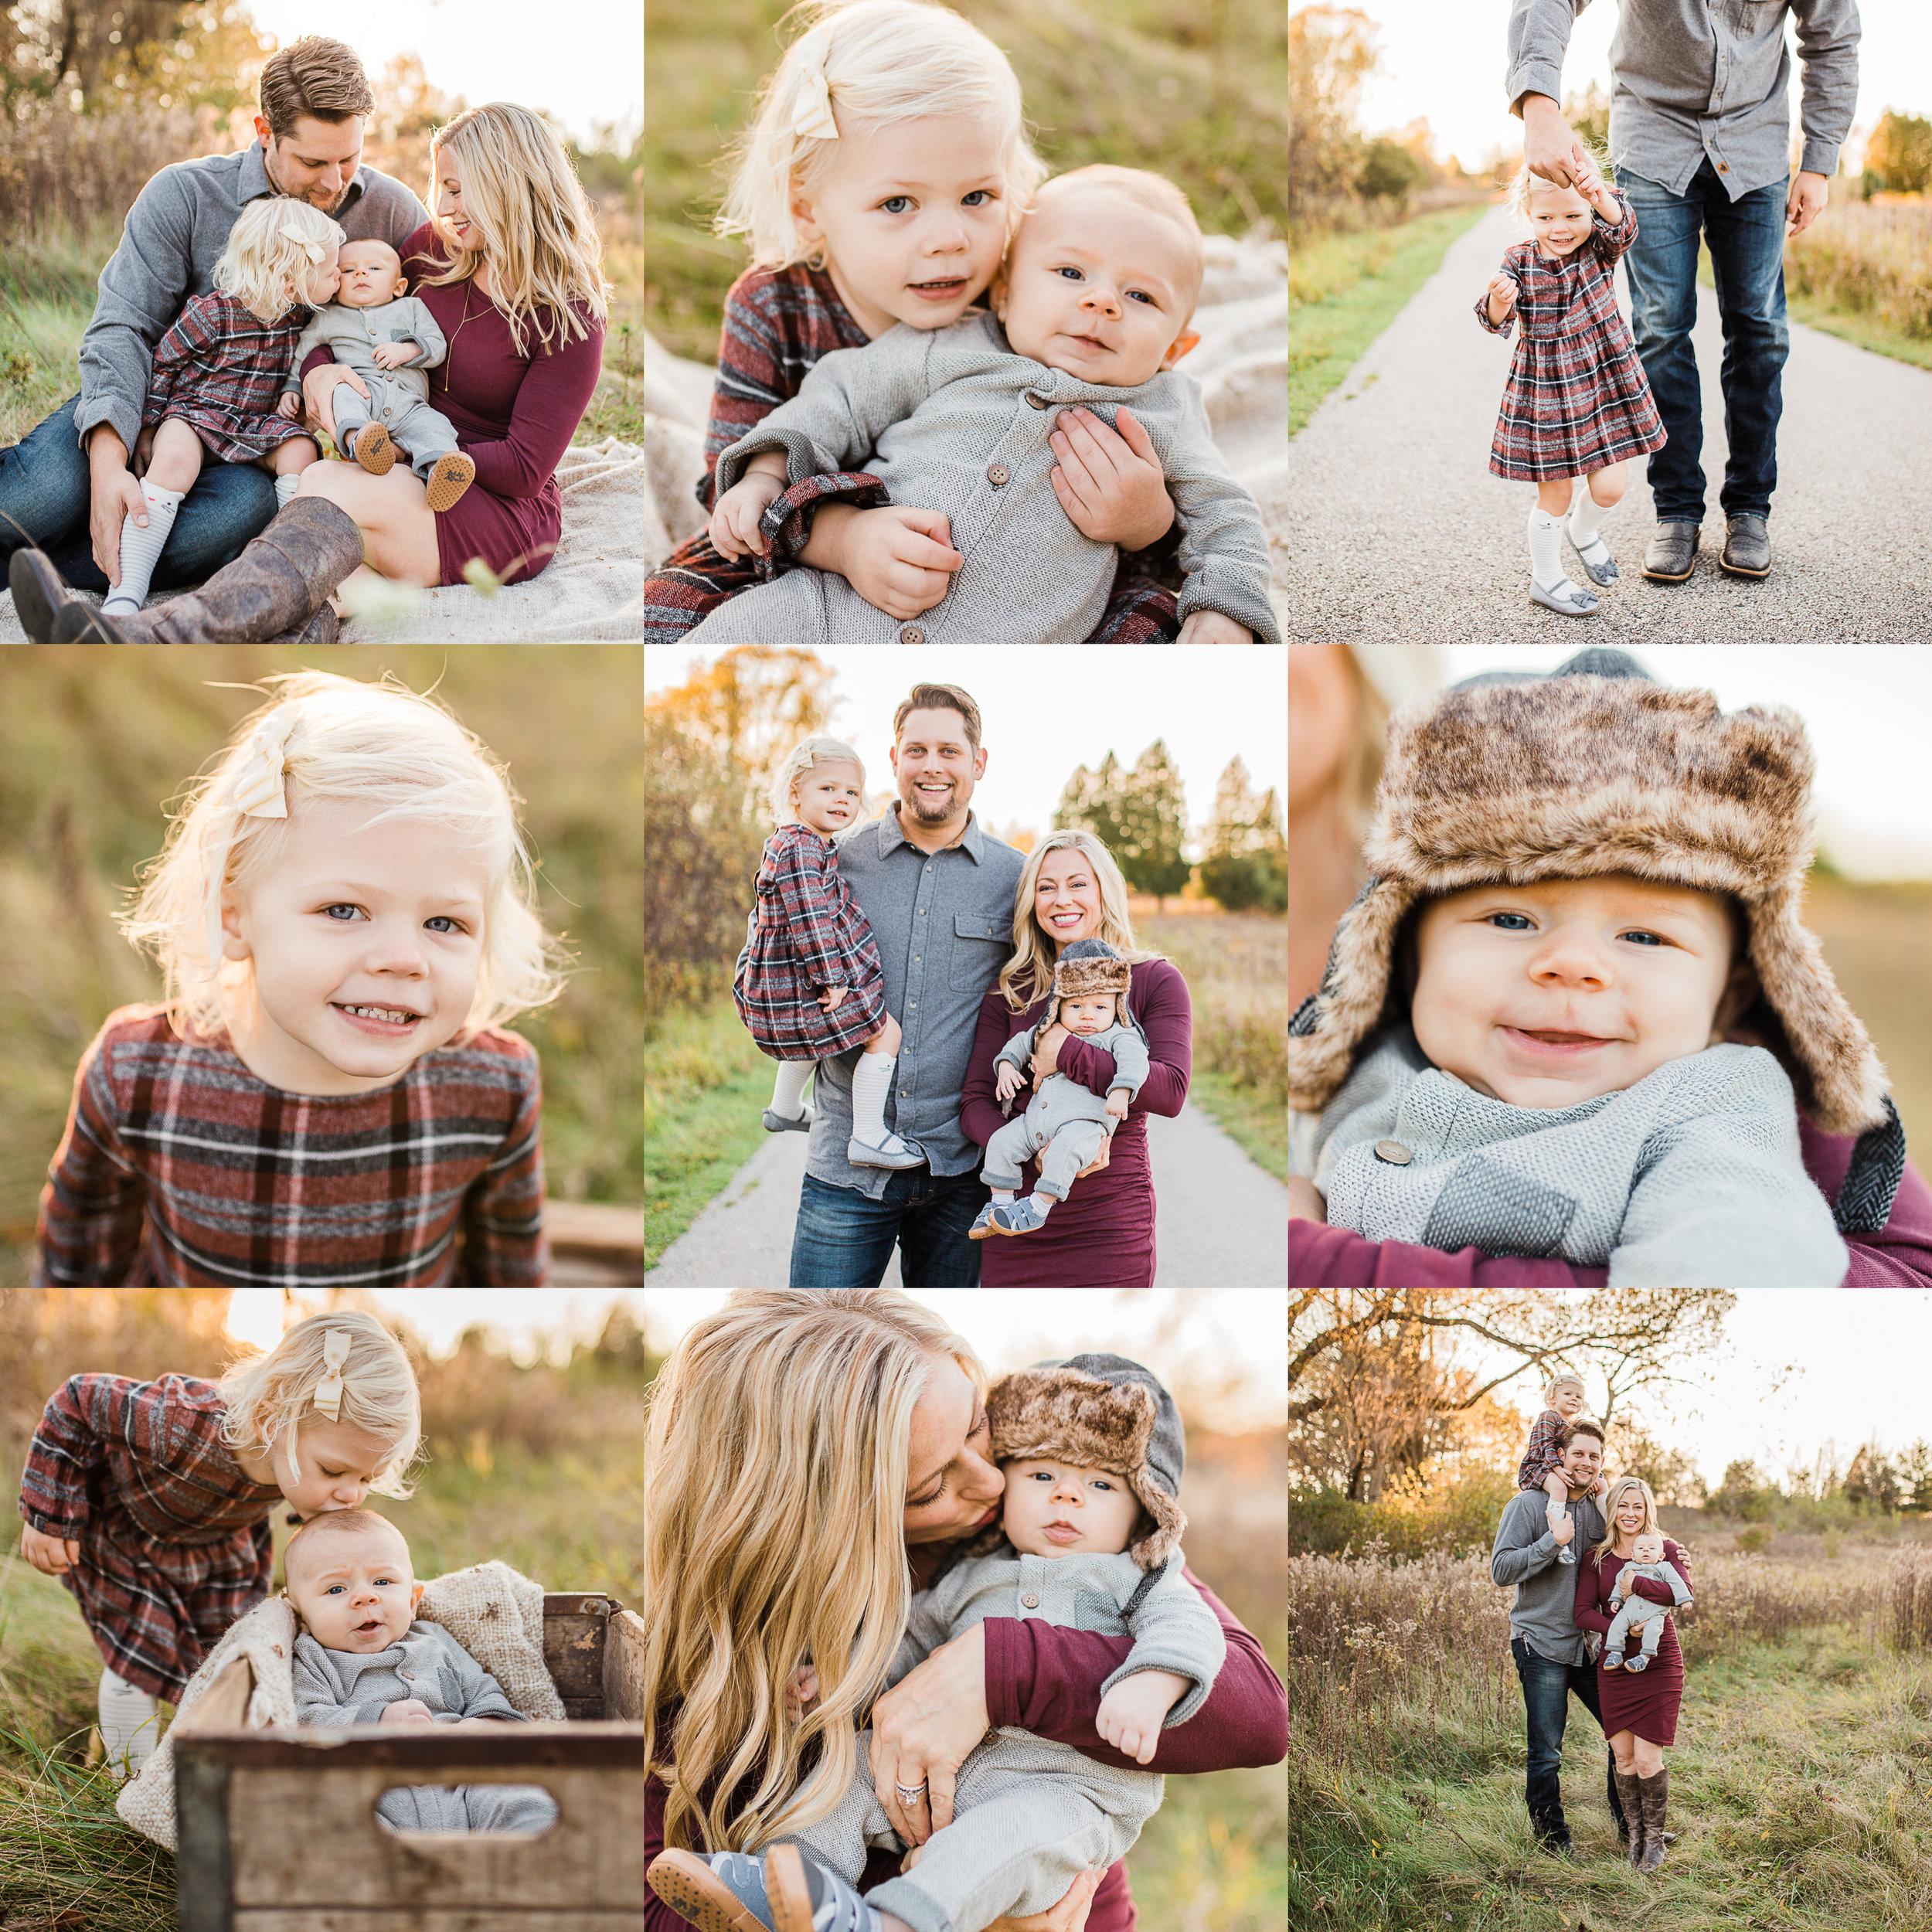 thoele-family-fall-photos-delafield-wi